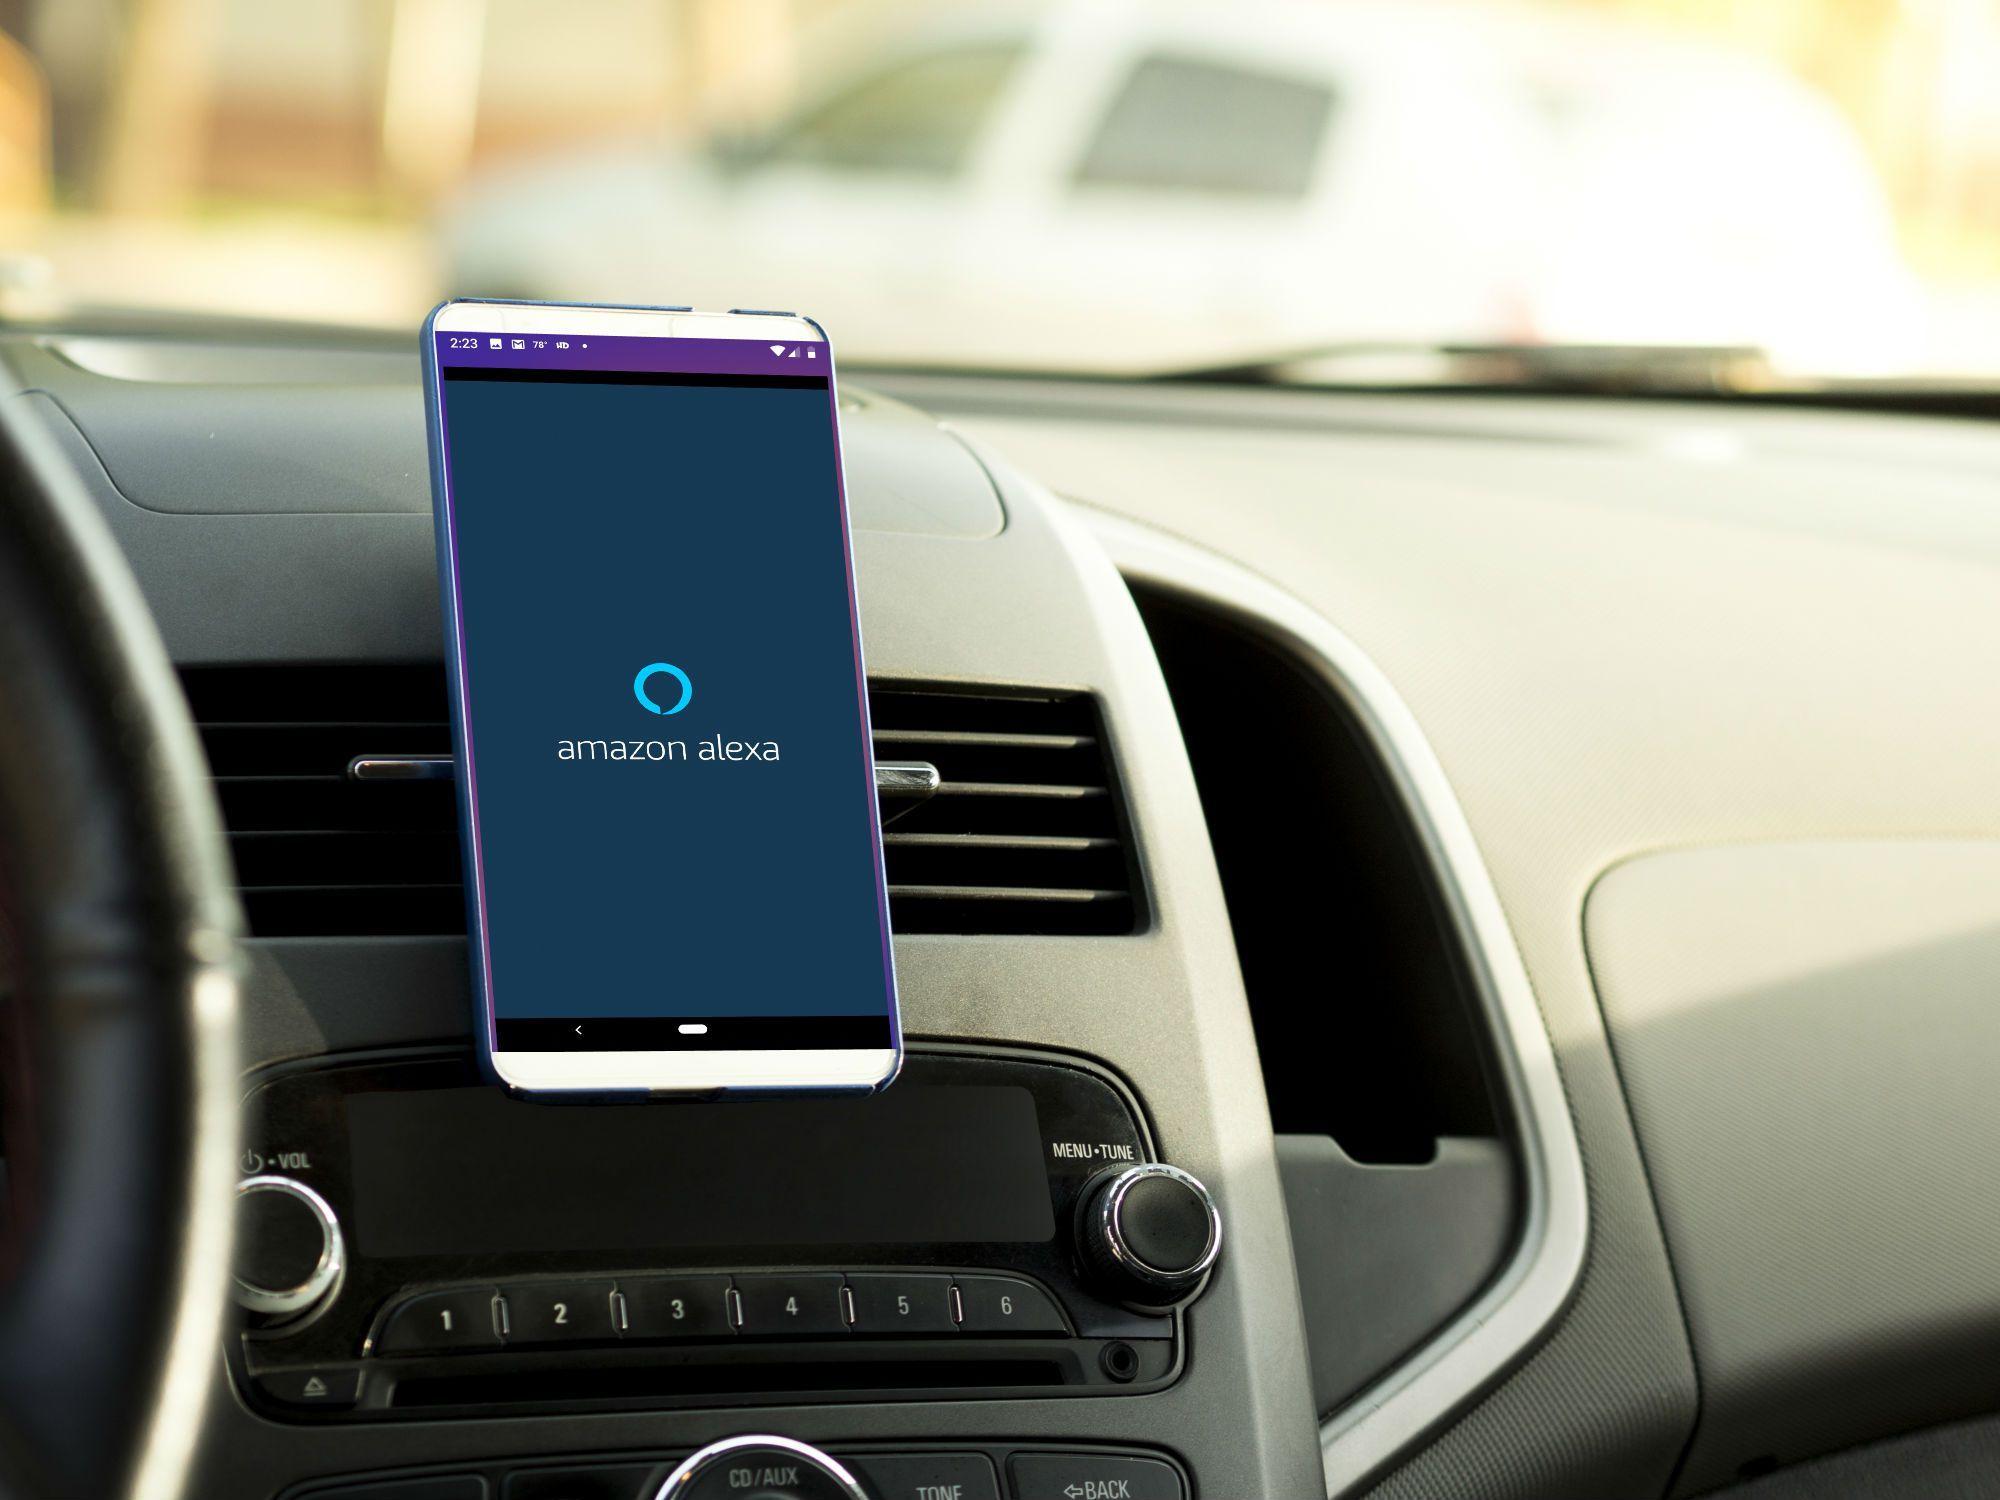 How to Get Amazon Alexa in Your Car Alexa device, Alexa